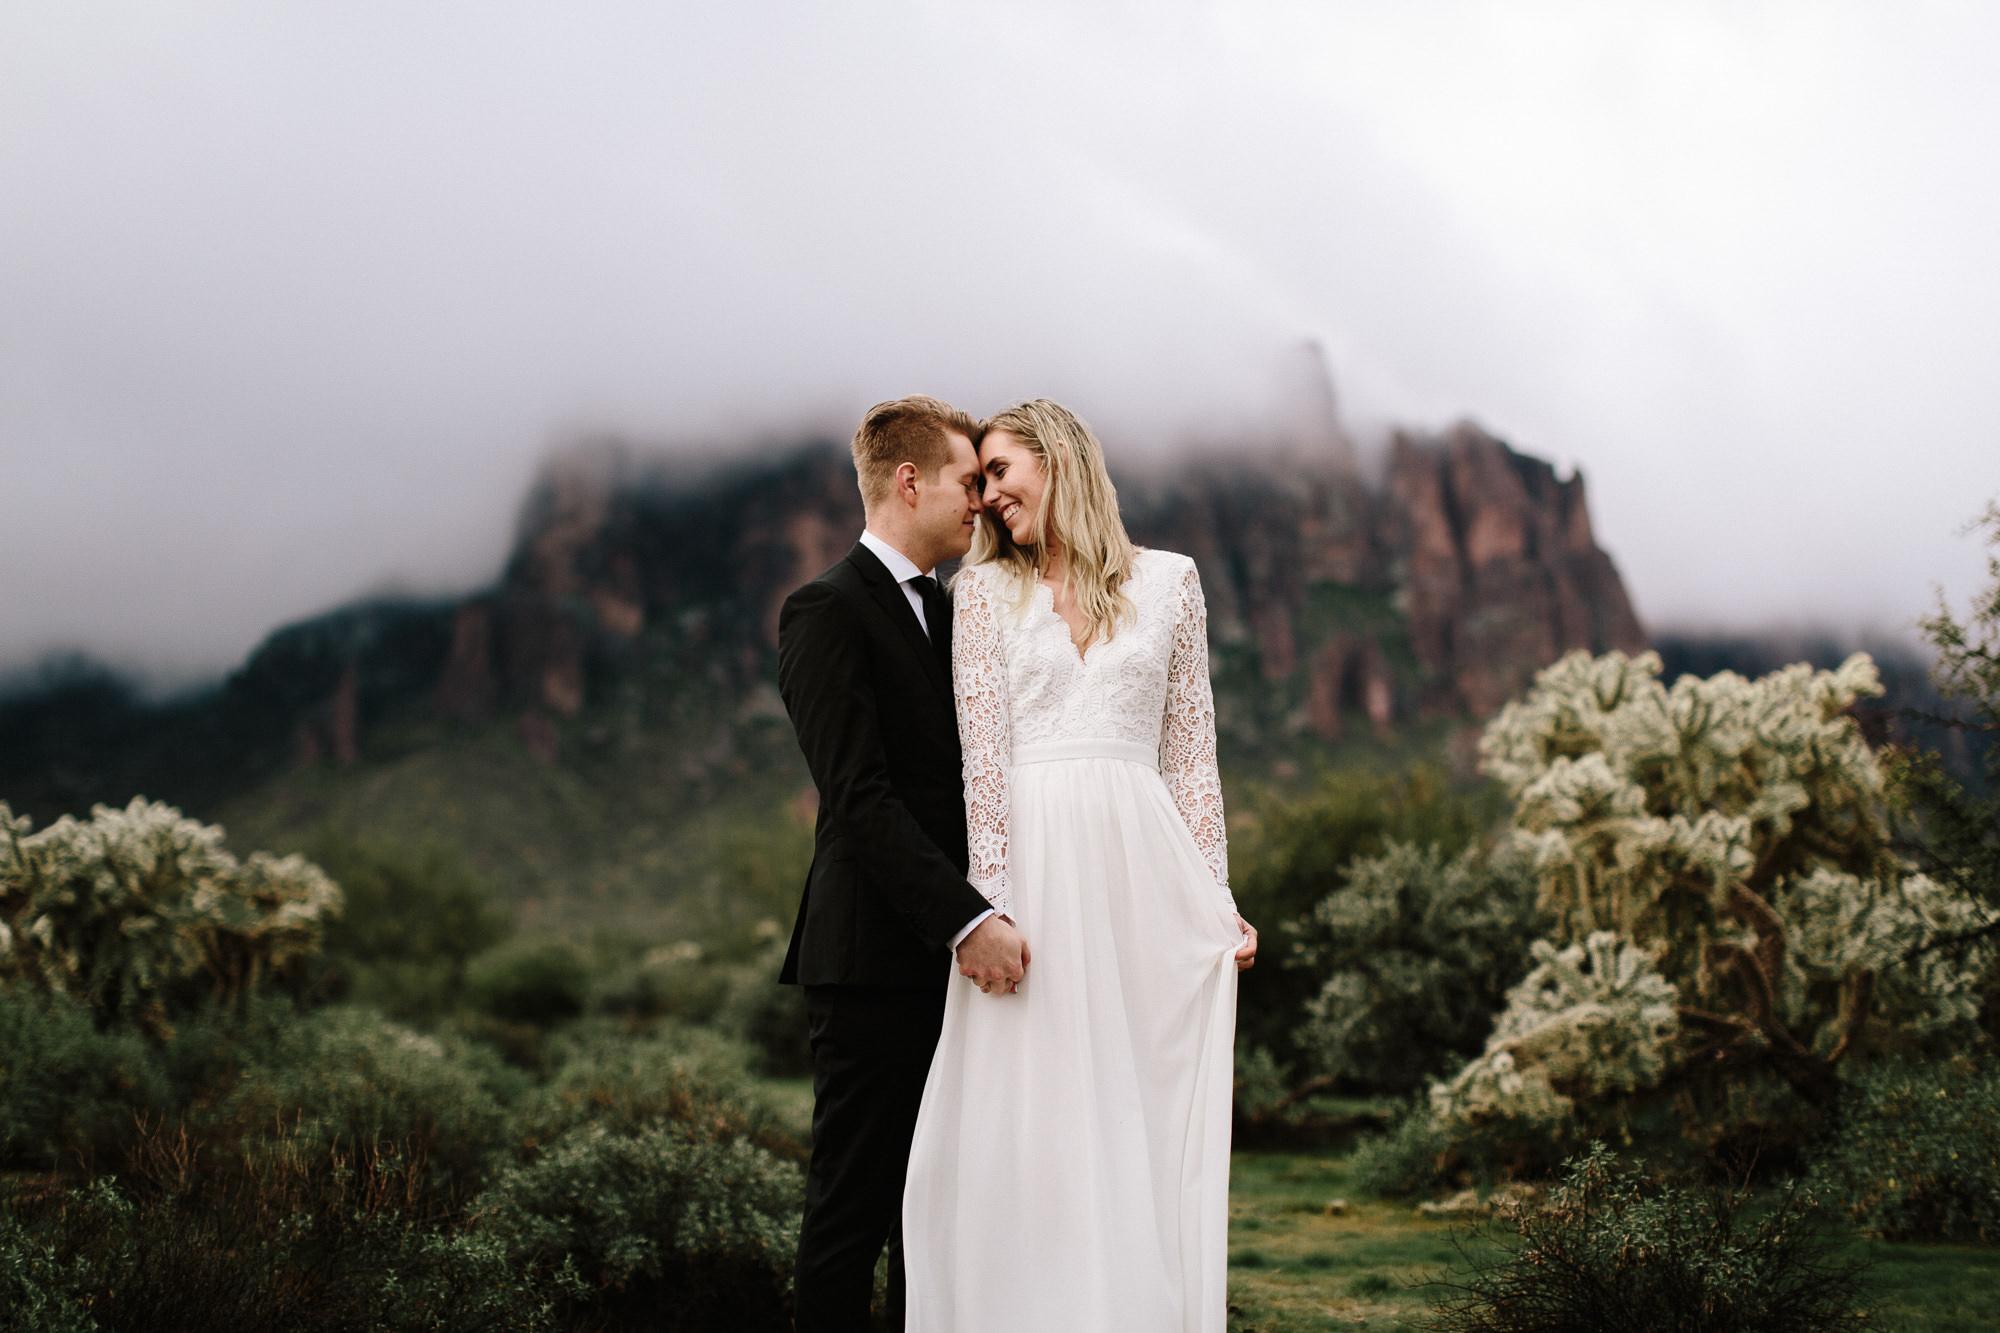 phoenix-mesa-elopement-wedding-photographer-lost-dutchman-state-park-superstitious-mountains-13.jpg